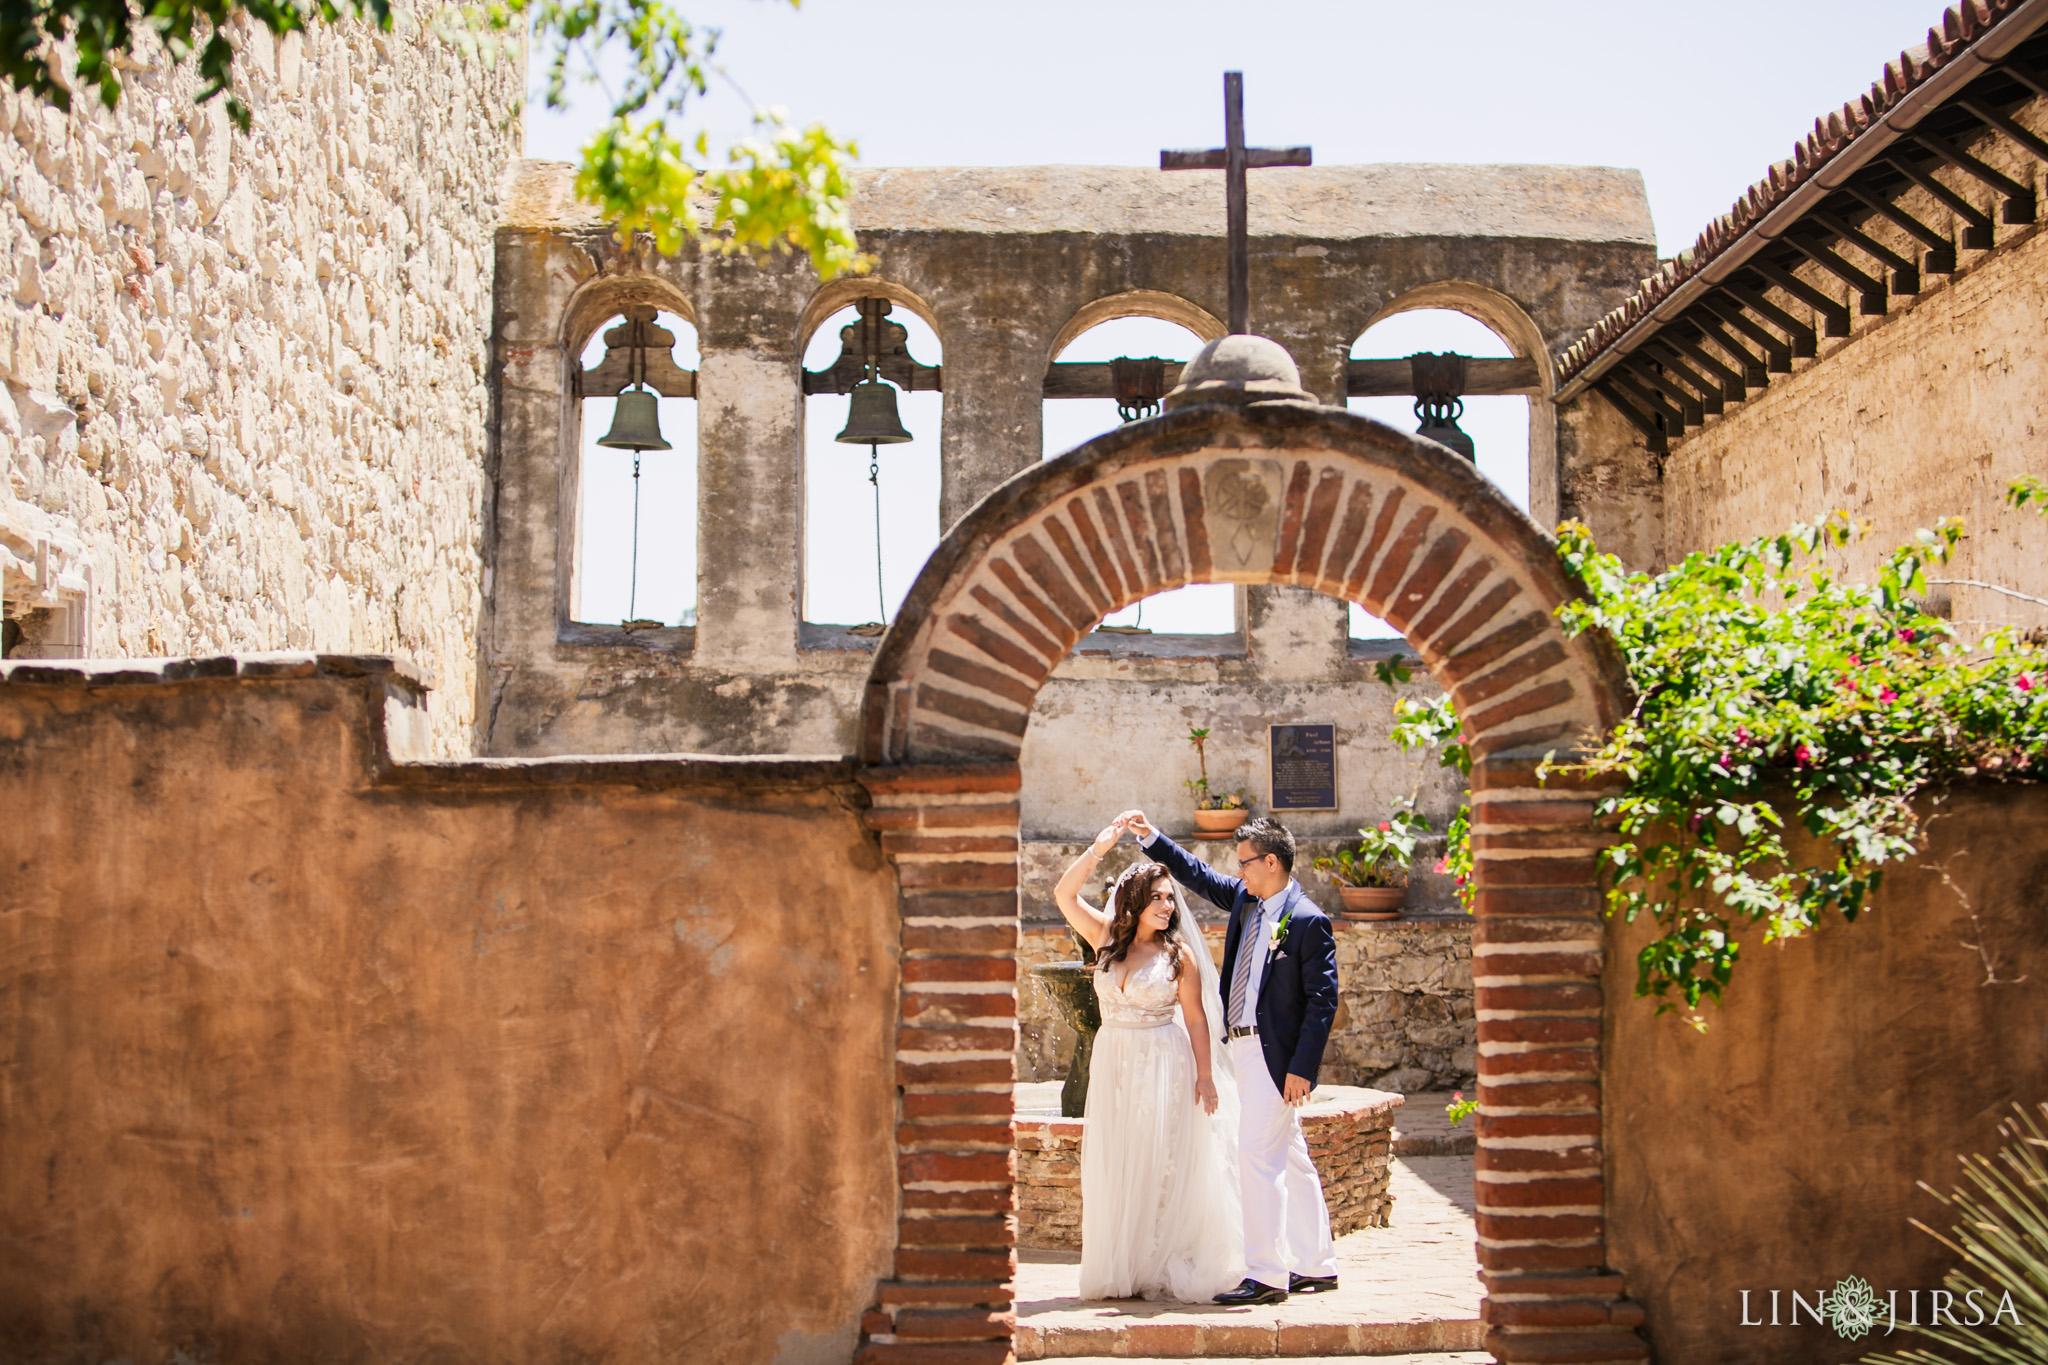 007 mission basilica san juan capistrano wedding photography